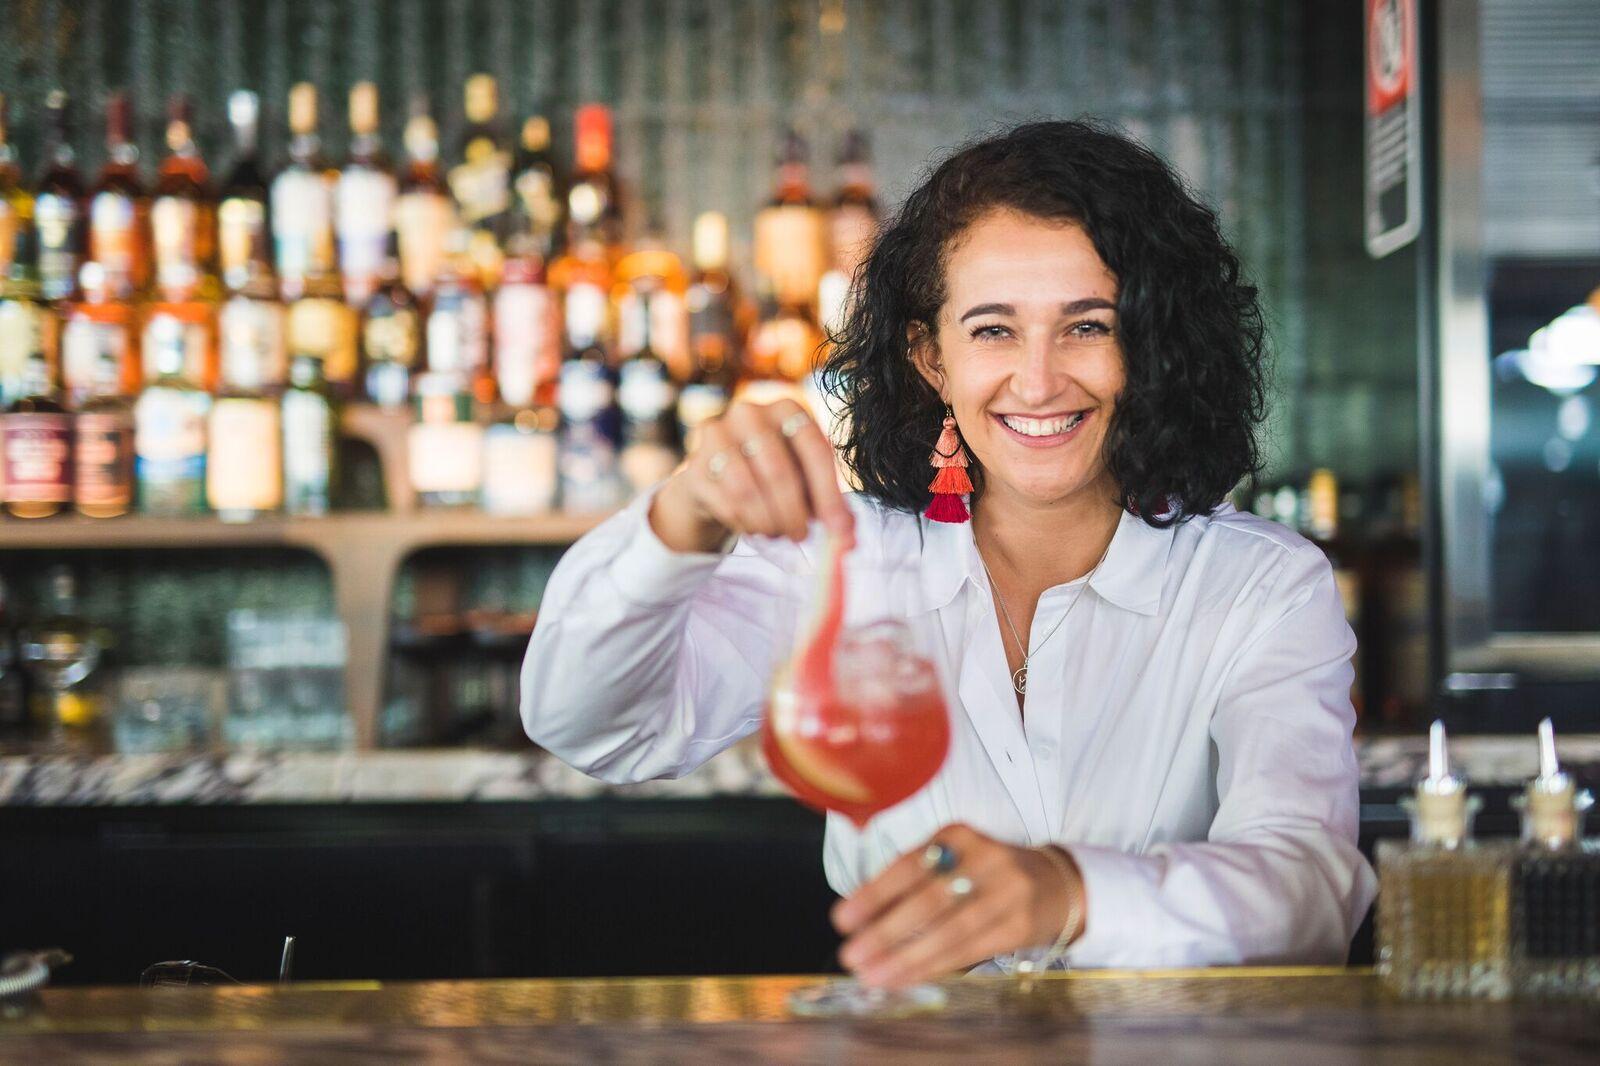 Smoke, Barangaroo, Streets of Barangaroo, Sydney's Best Bars, Things to do in Sydney, 24 hours in Barangaroo